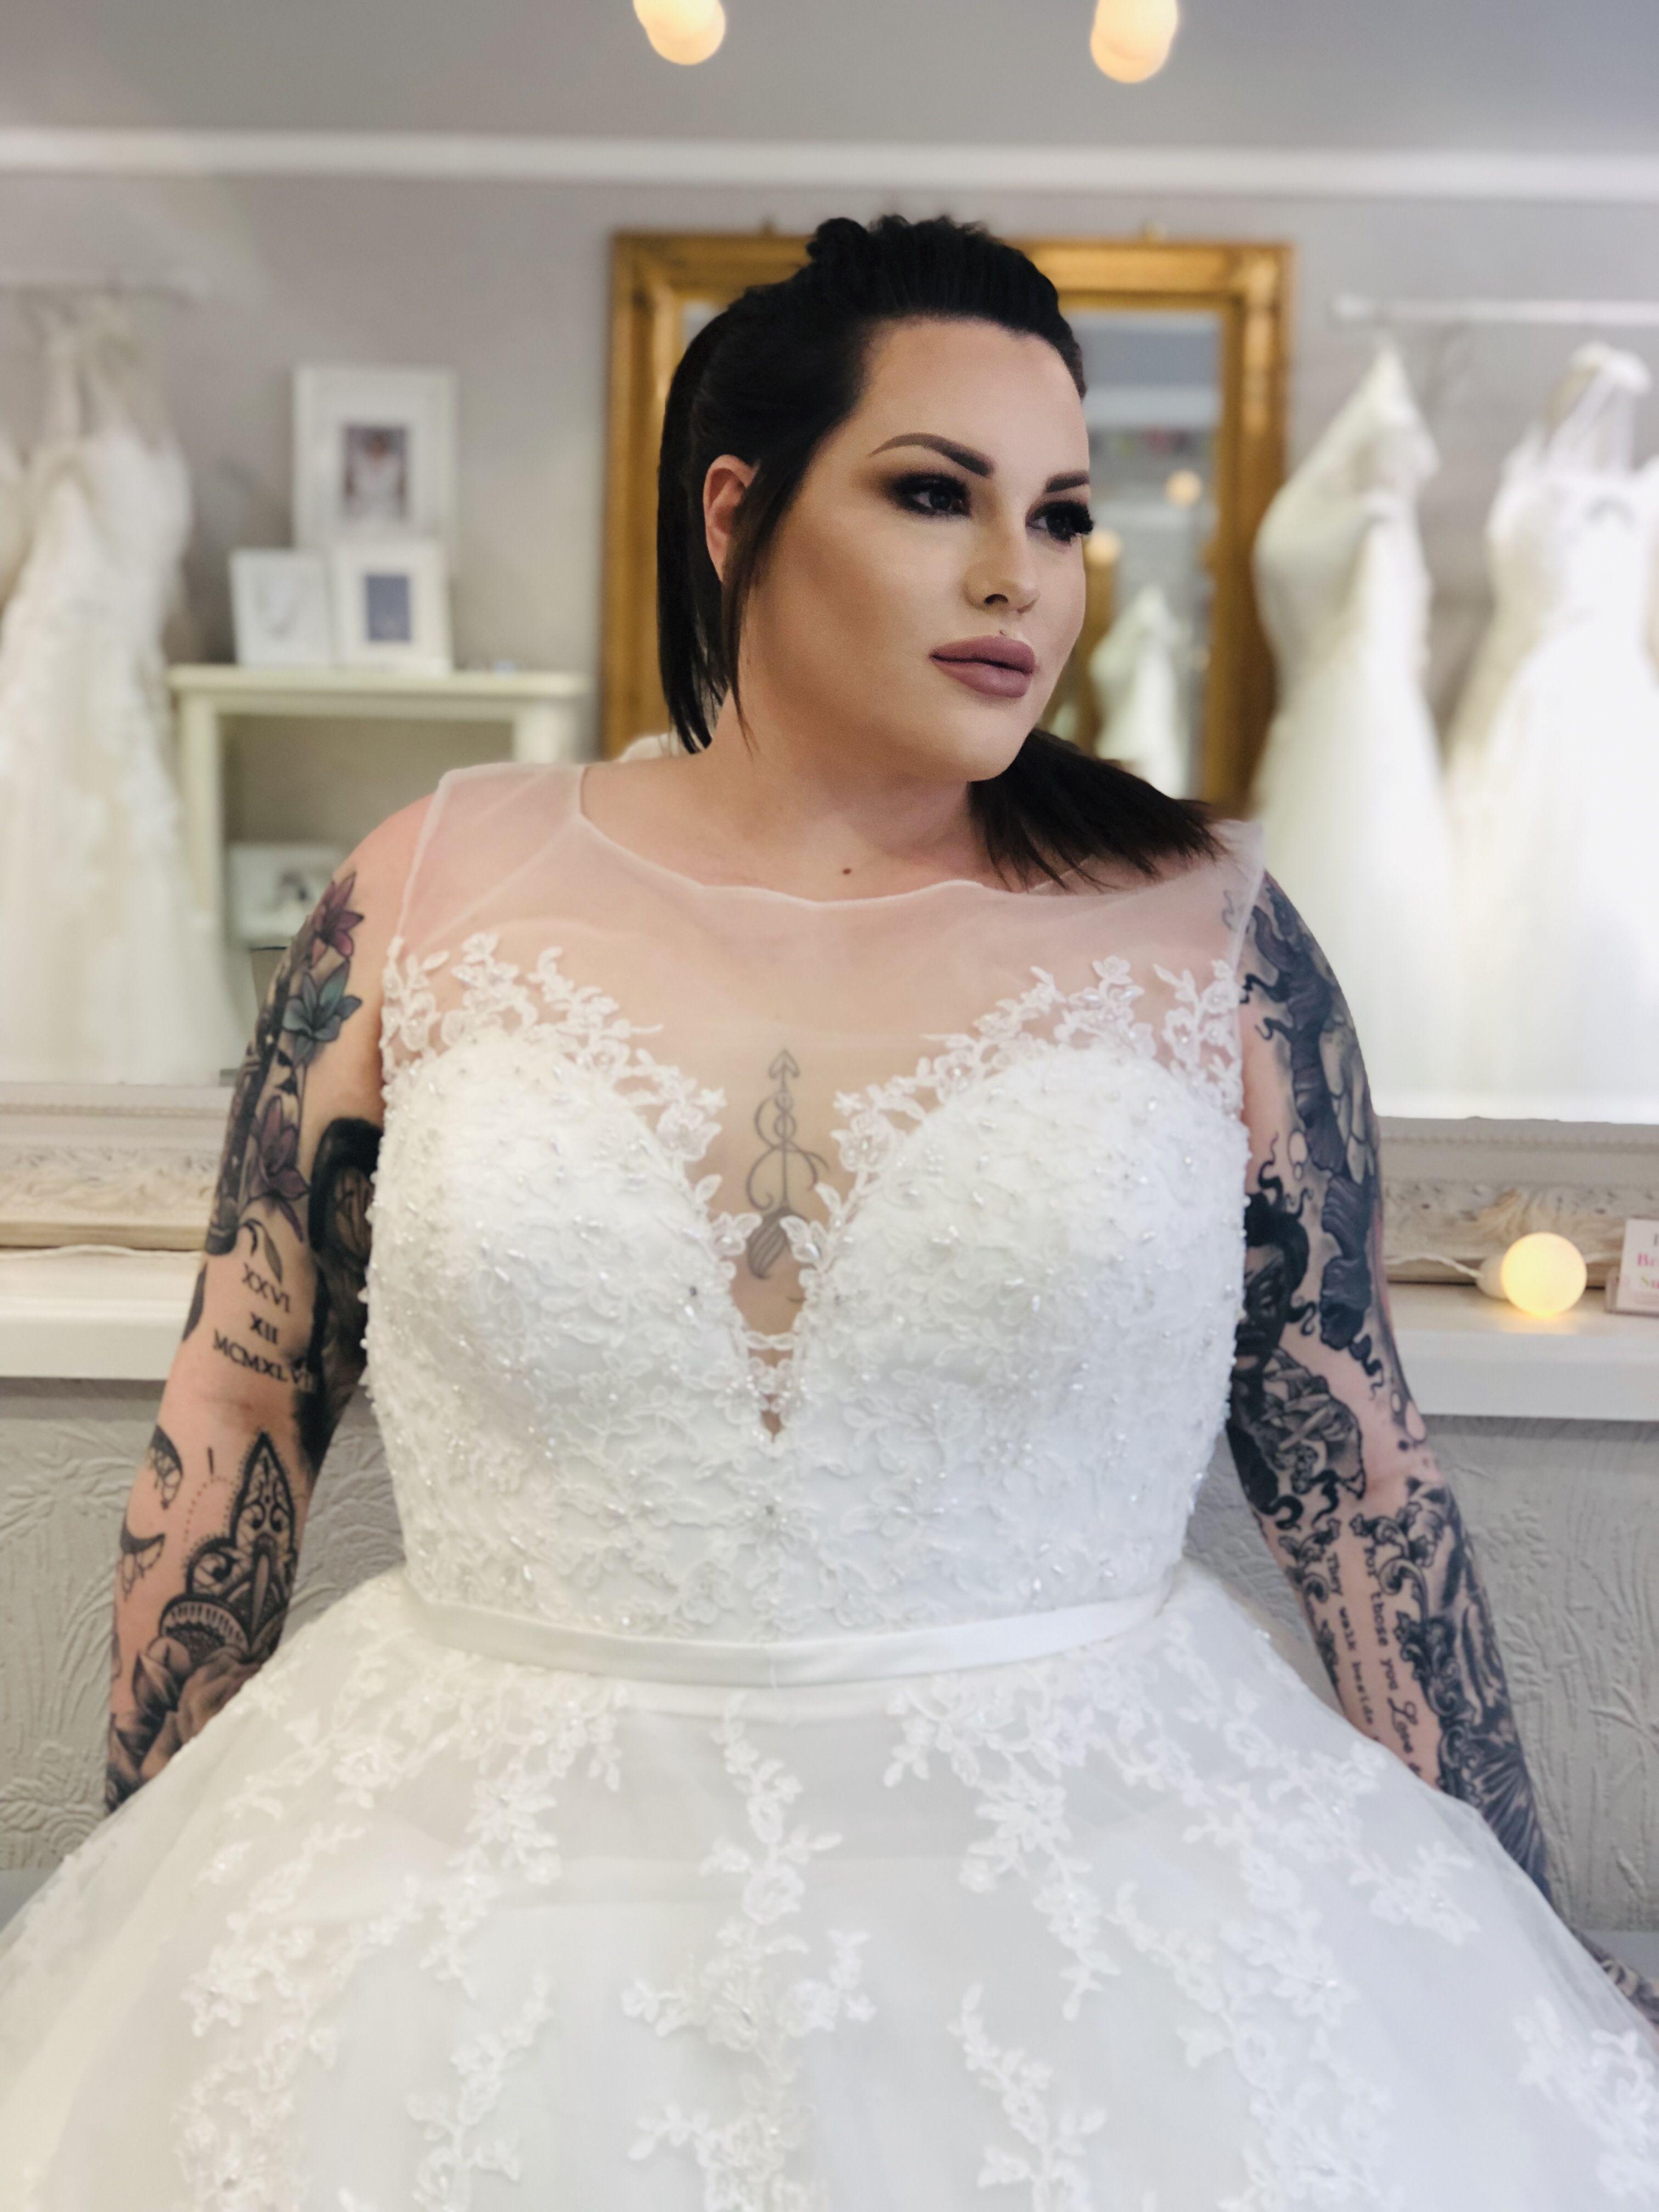 Curvy Bride To Be Kaytee Wearing The Beautiful Las Vegas Dress By Callista Bride Curvy Bride Plus Size Bride Bridal Dresses,Black Woman Mermaid Wedding Dresses 2020